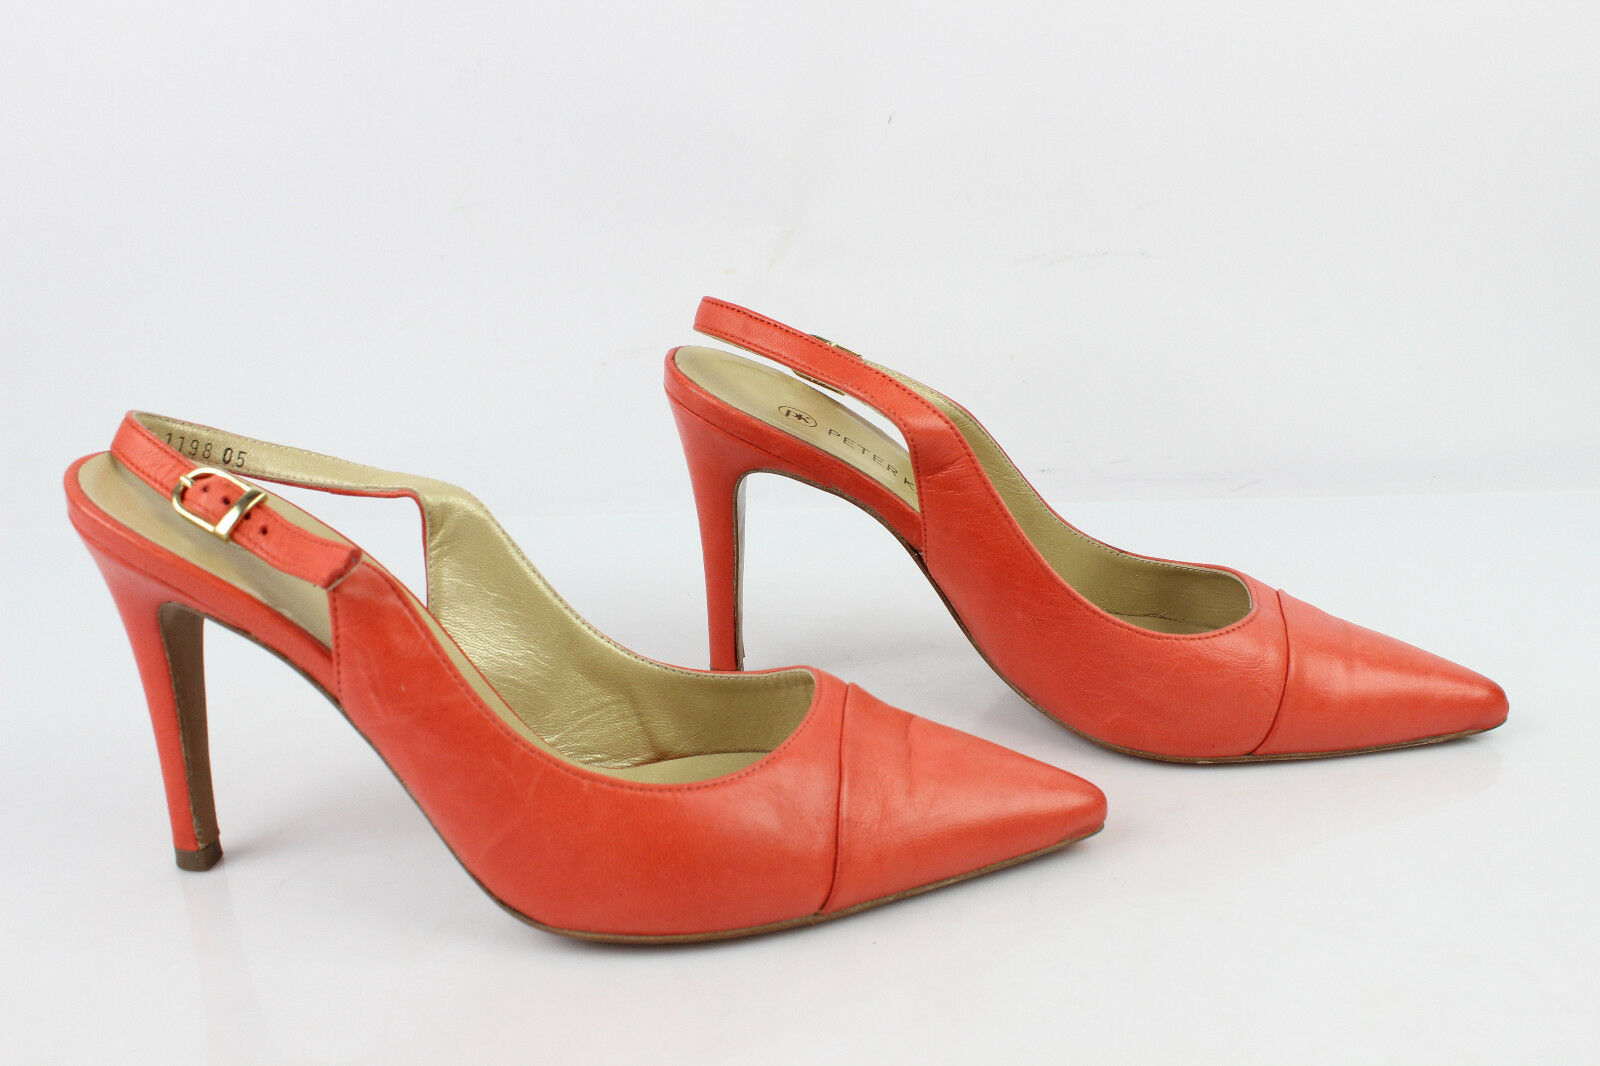 Open Court Court Court shoes PETER KAISER All Leather orange UK 5,5 FR 38,5 807bde